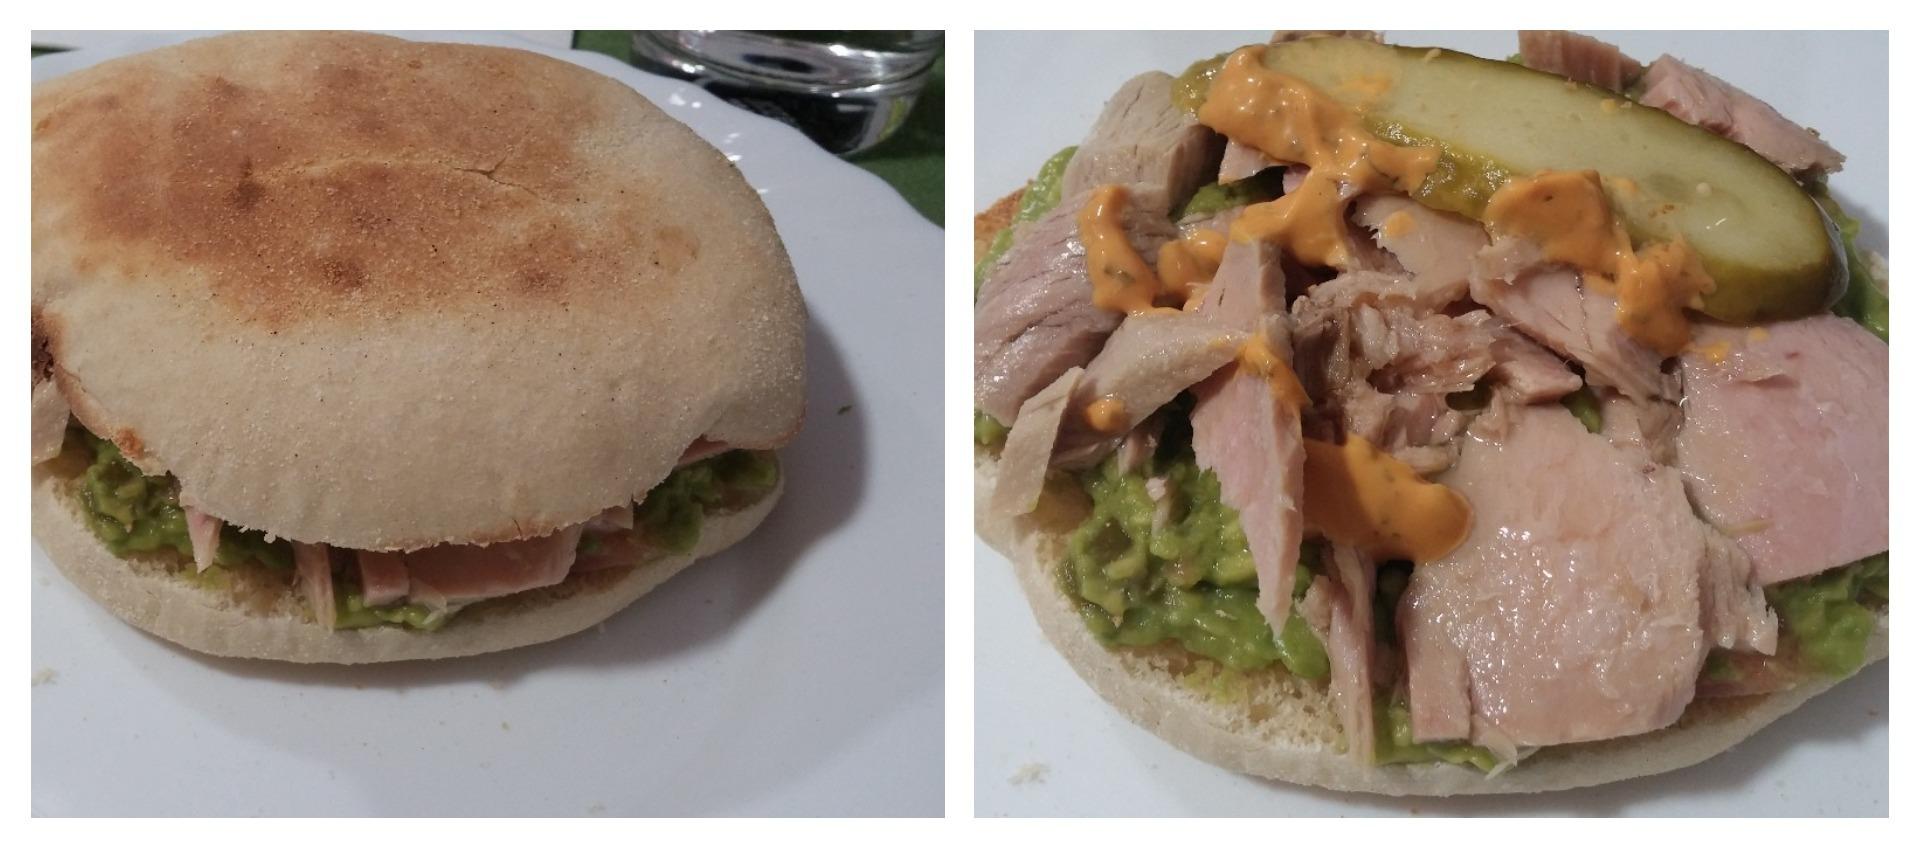 American-style tuna burgers